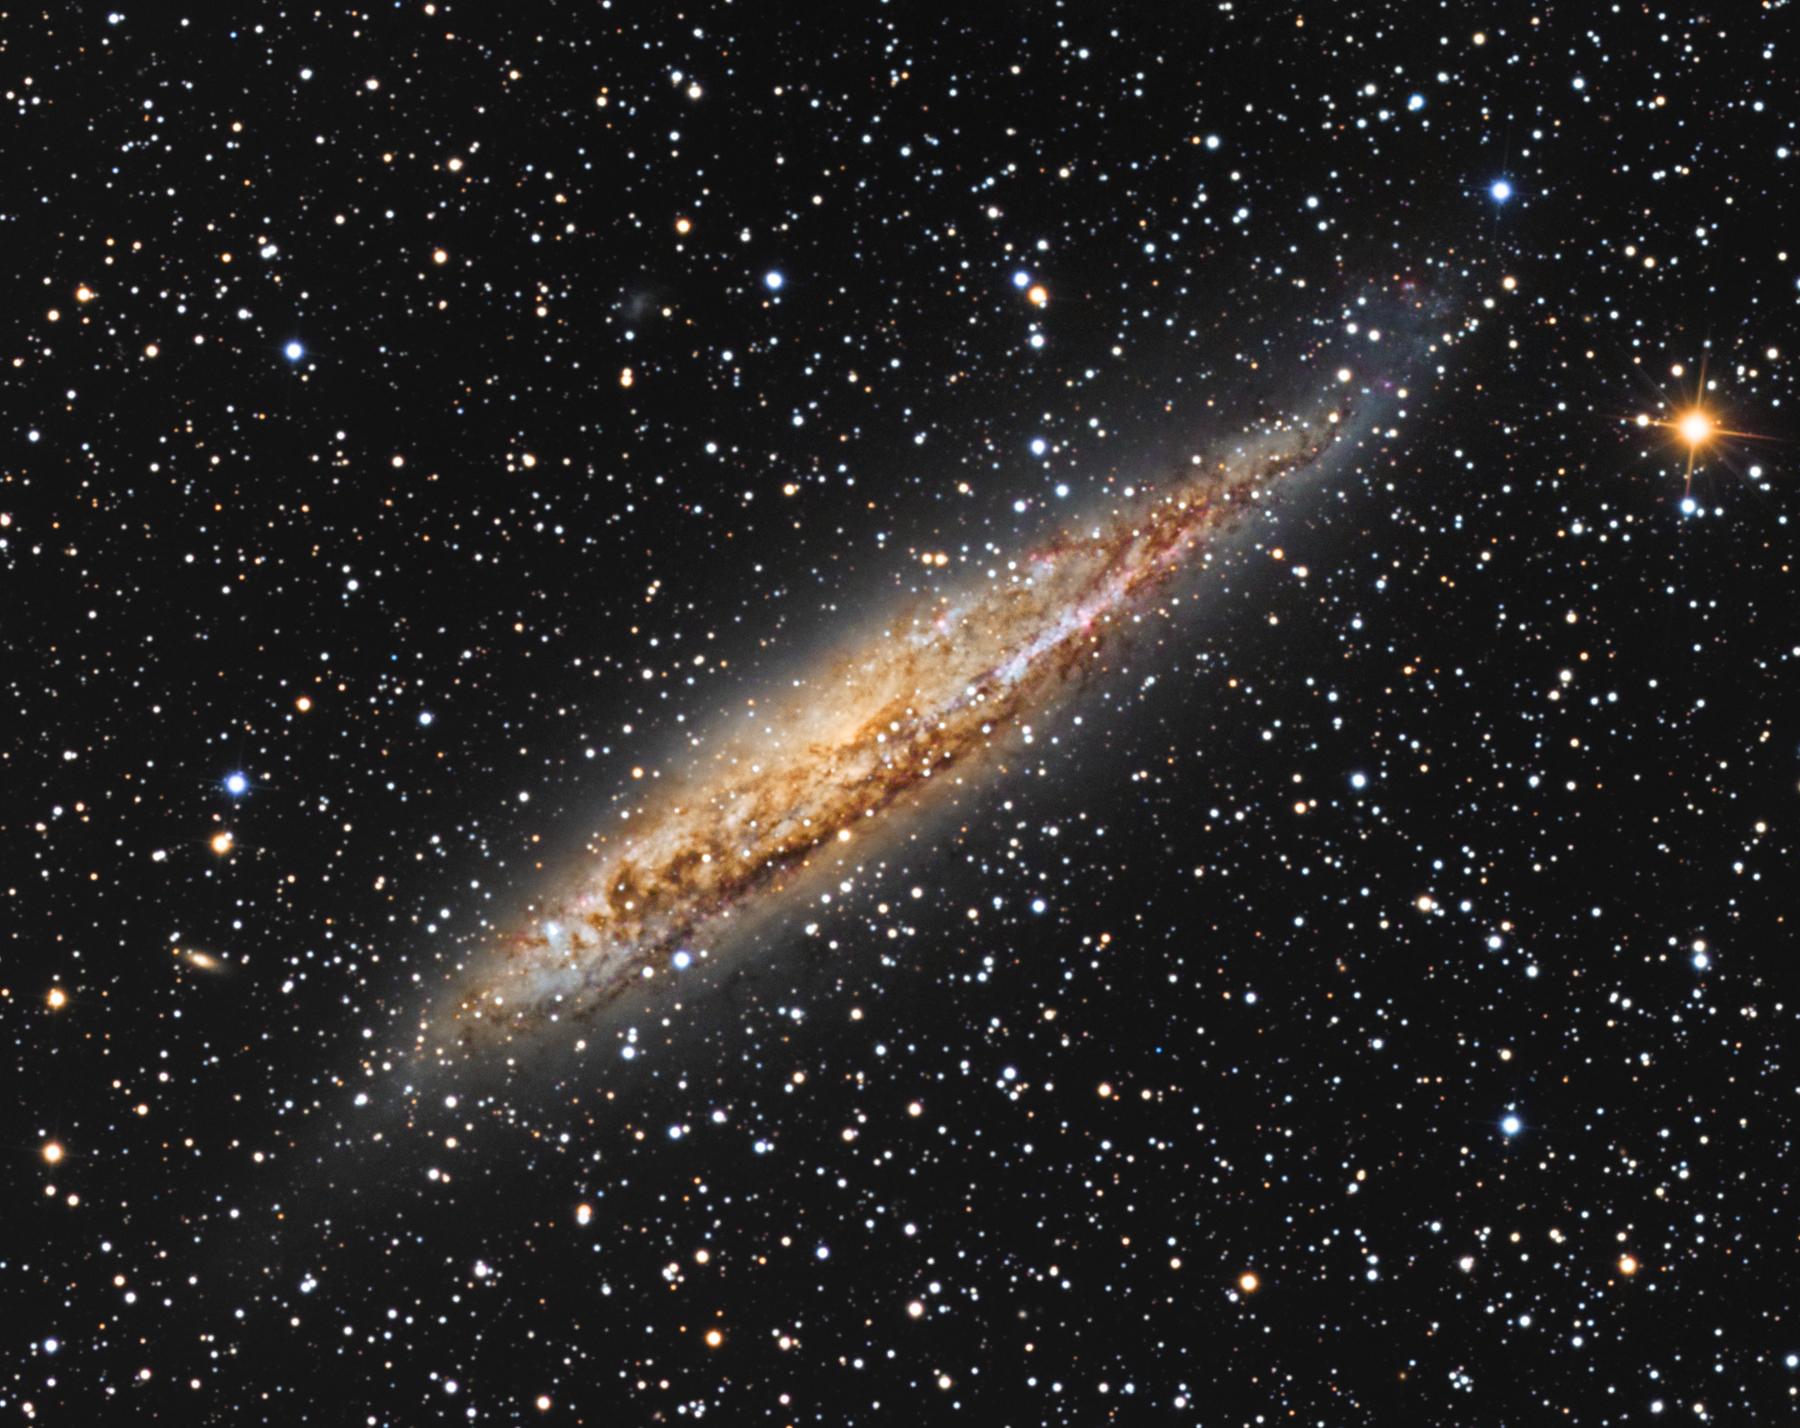 NGC4945-LRGB-20150216-T30-300s-TTK